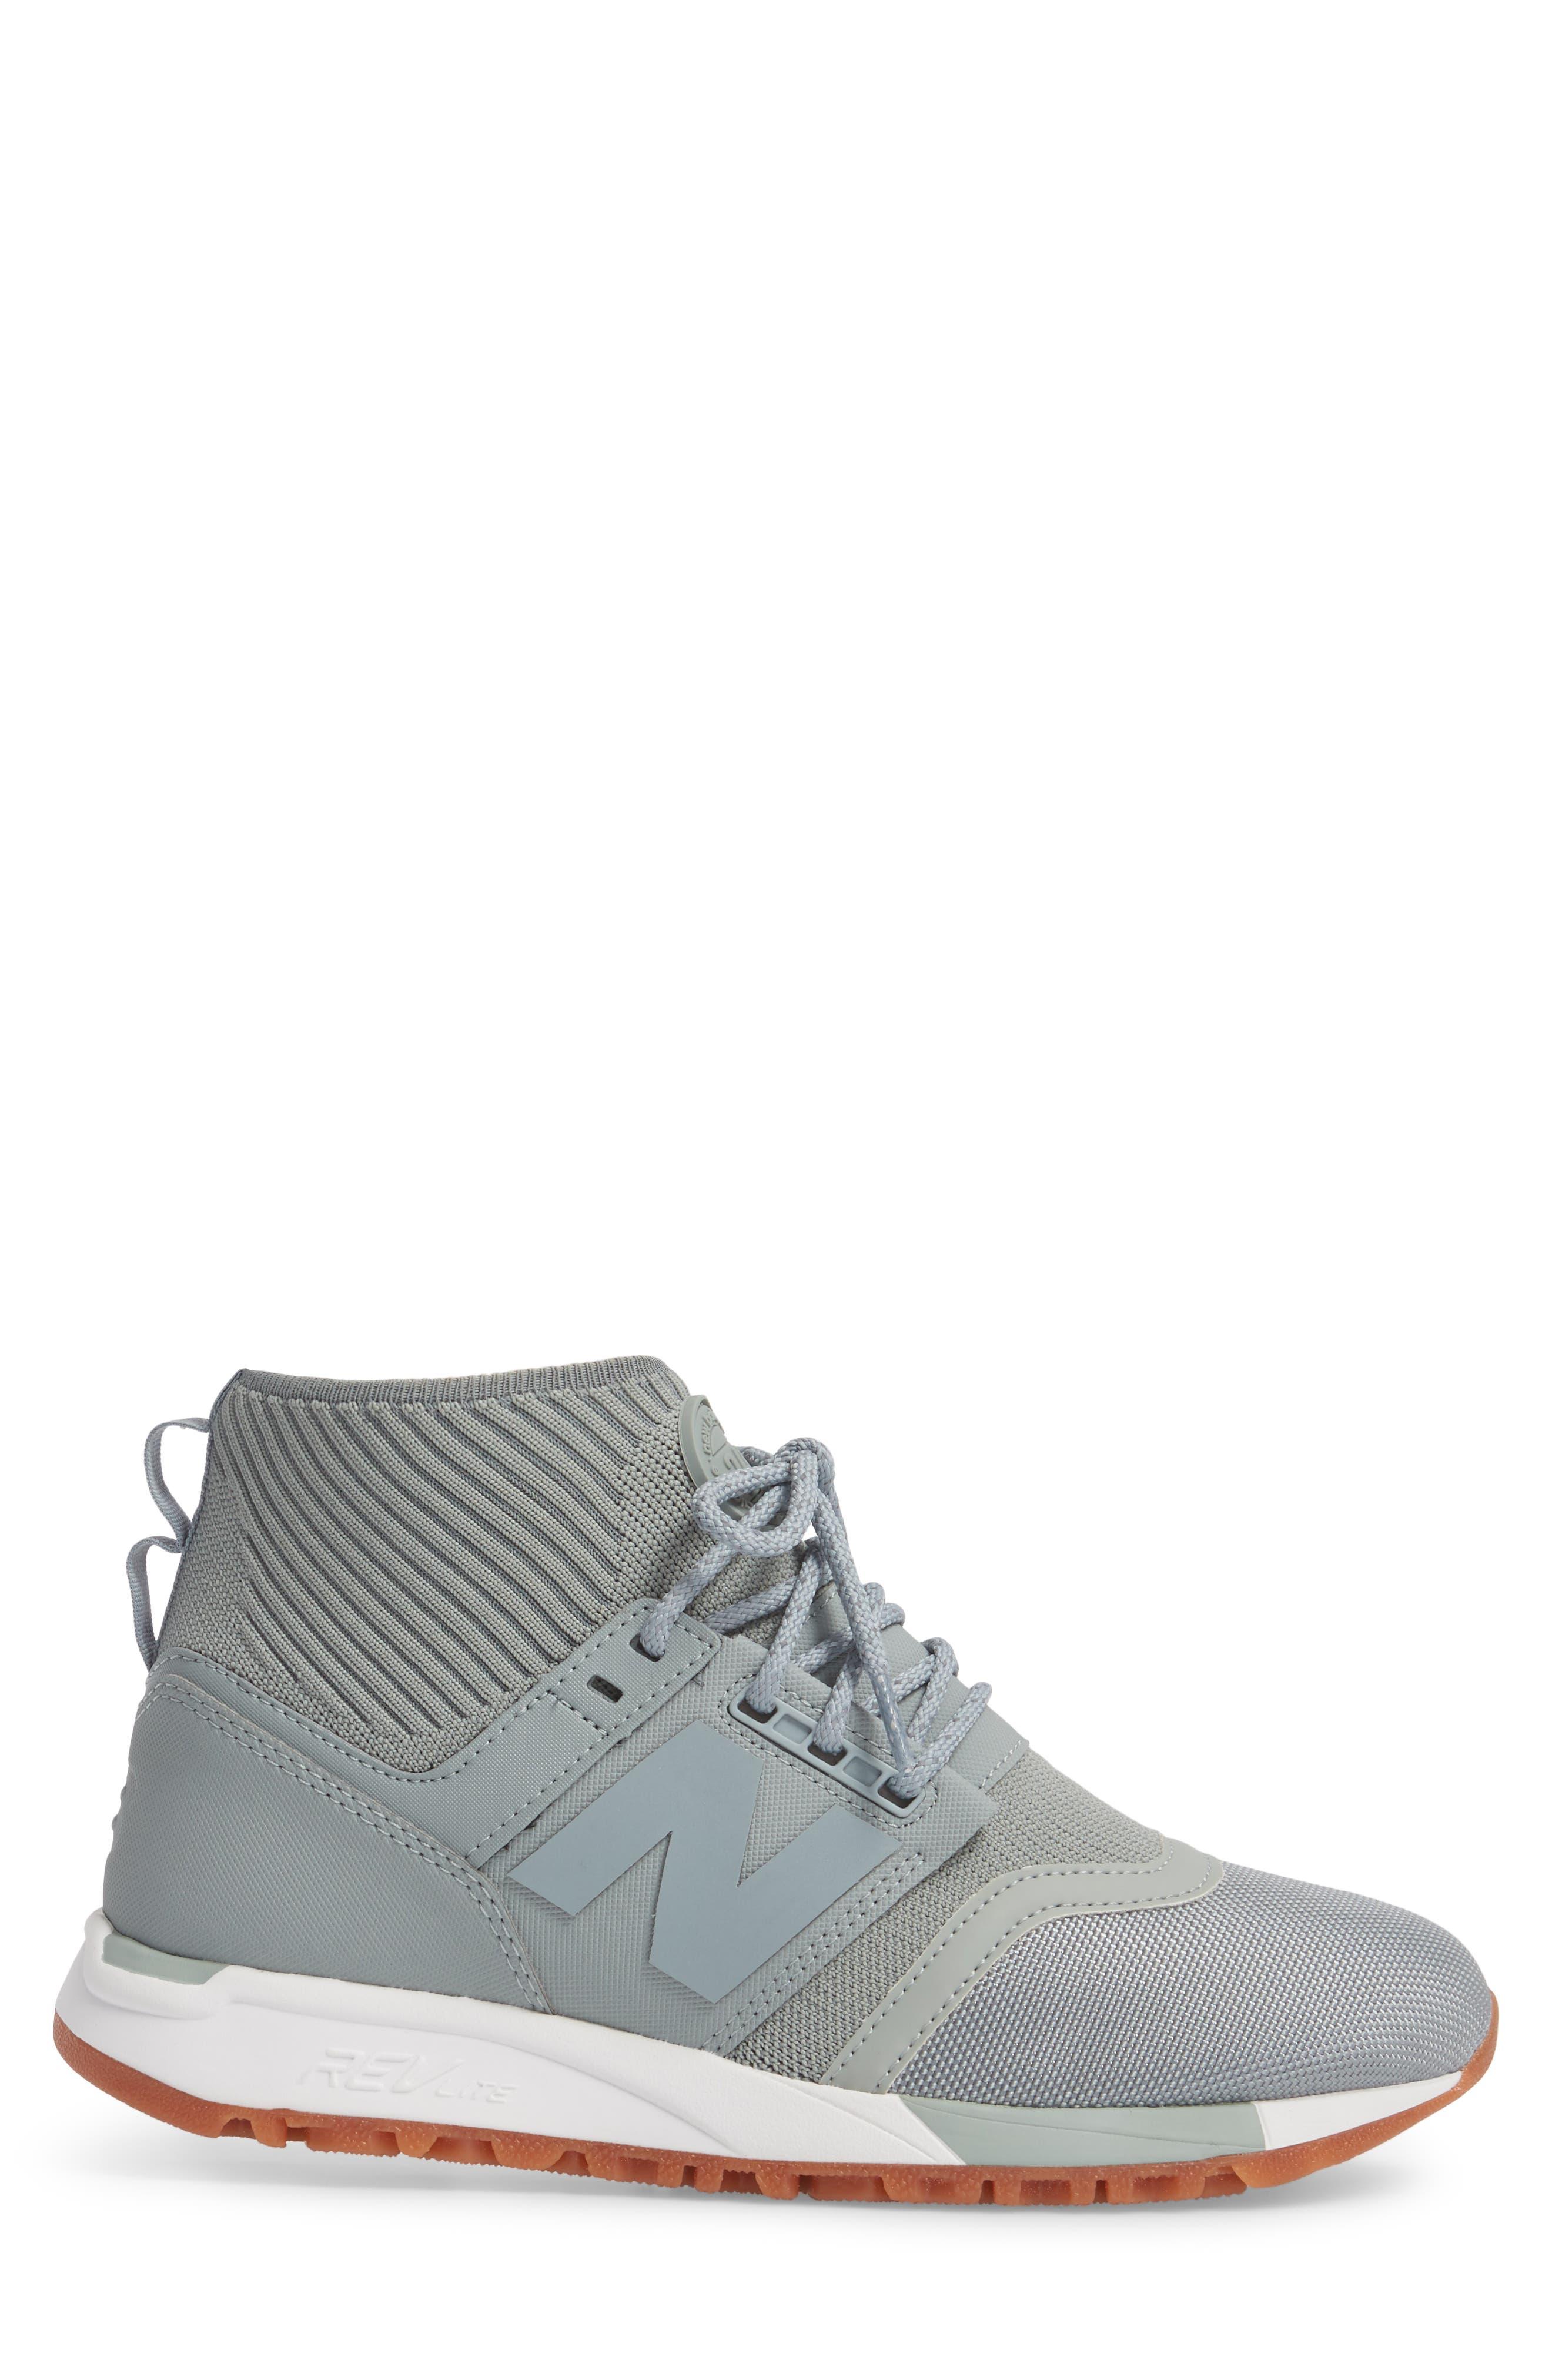 247 Mid Sneaker,                             Alternate thumbnail 10, color,